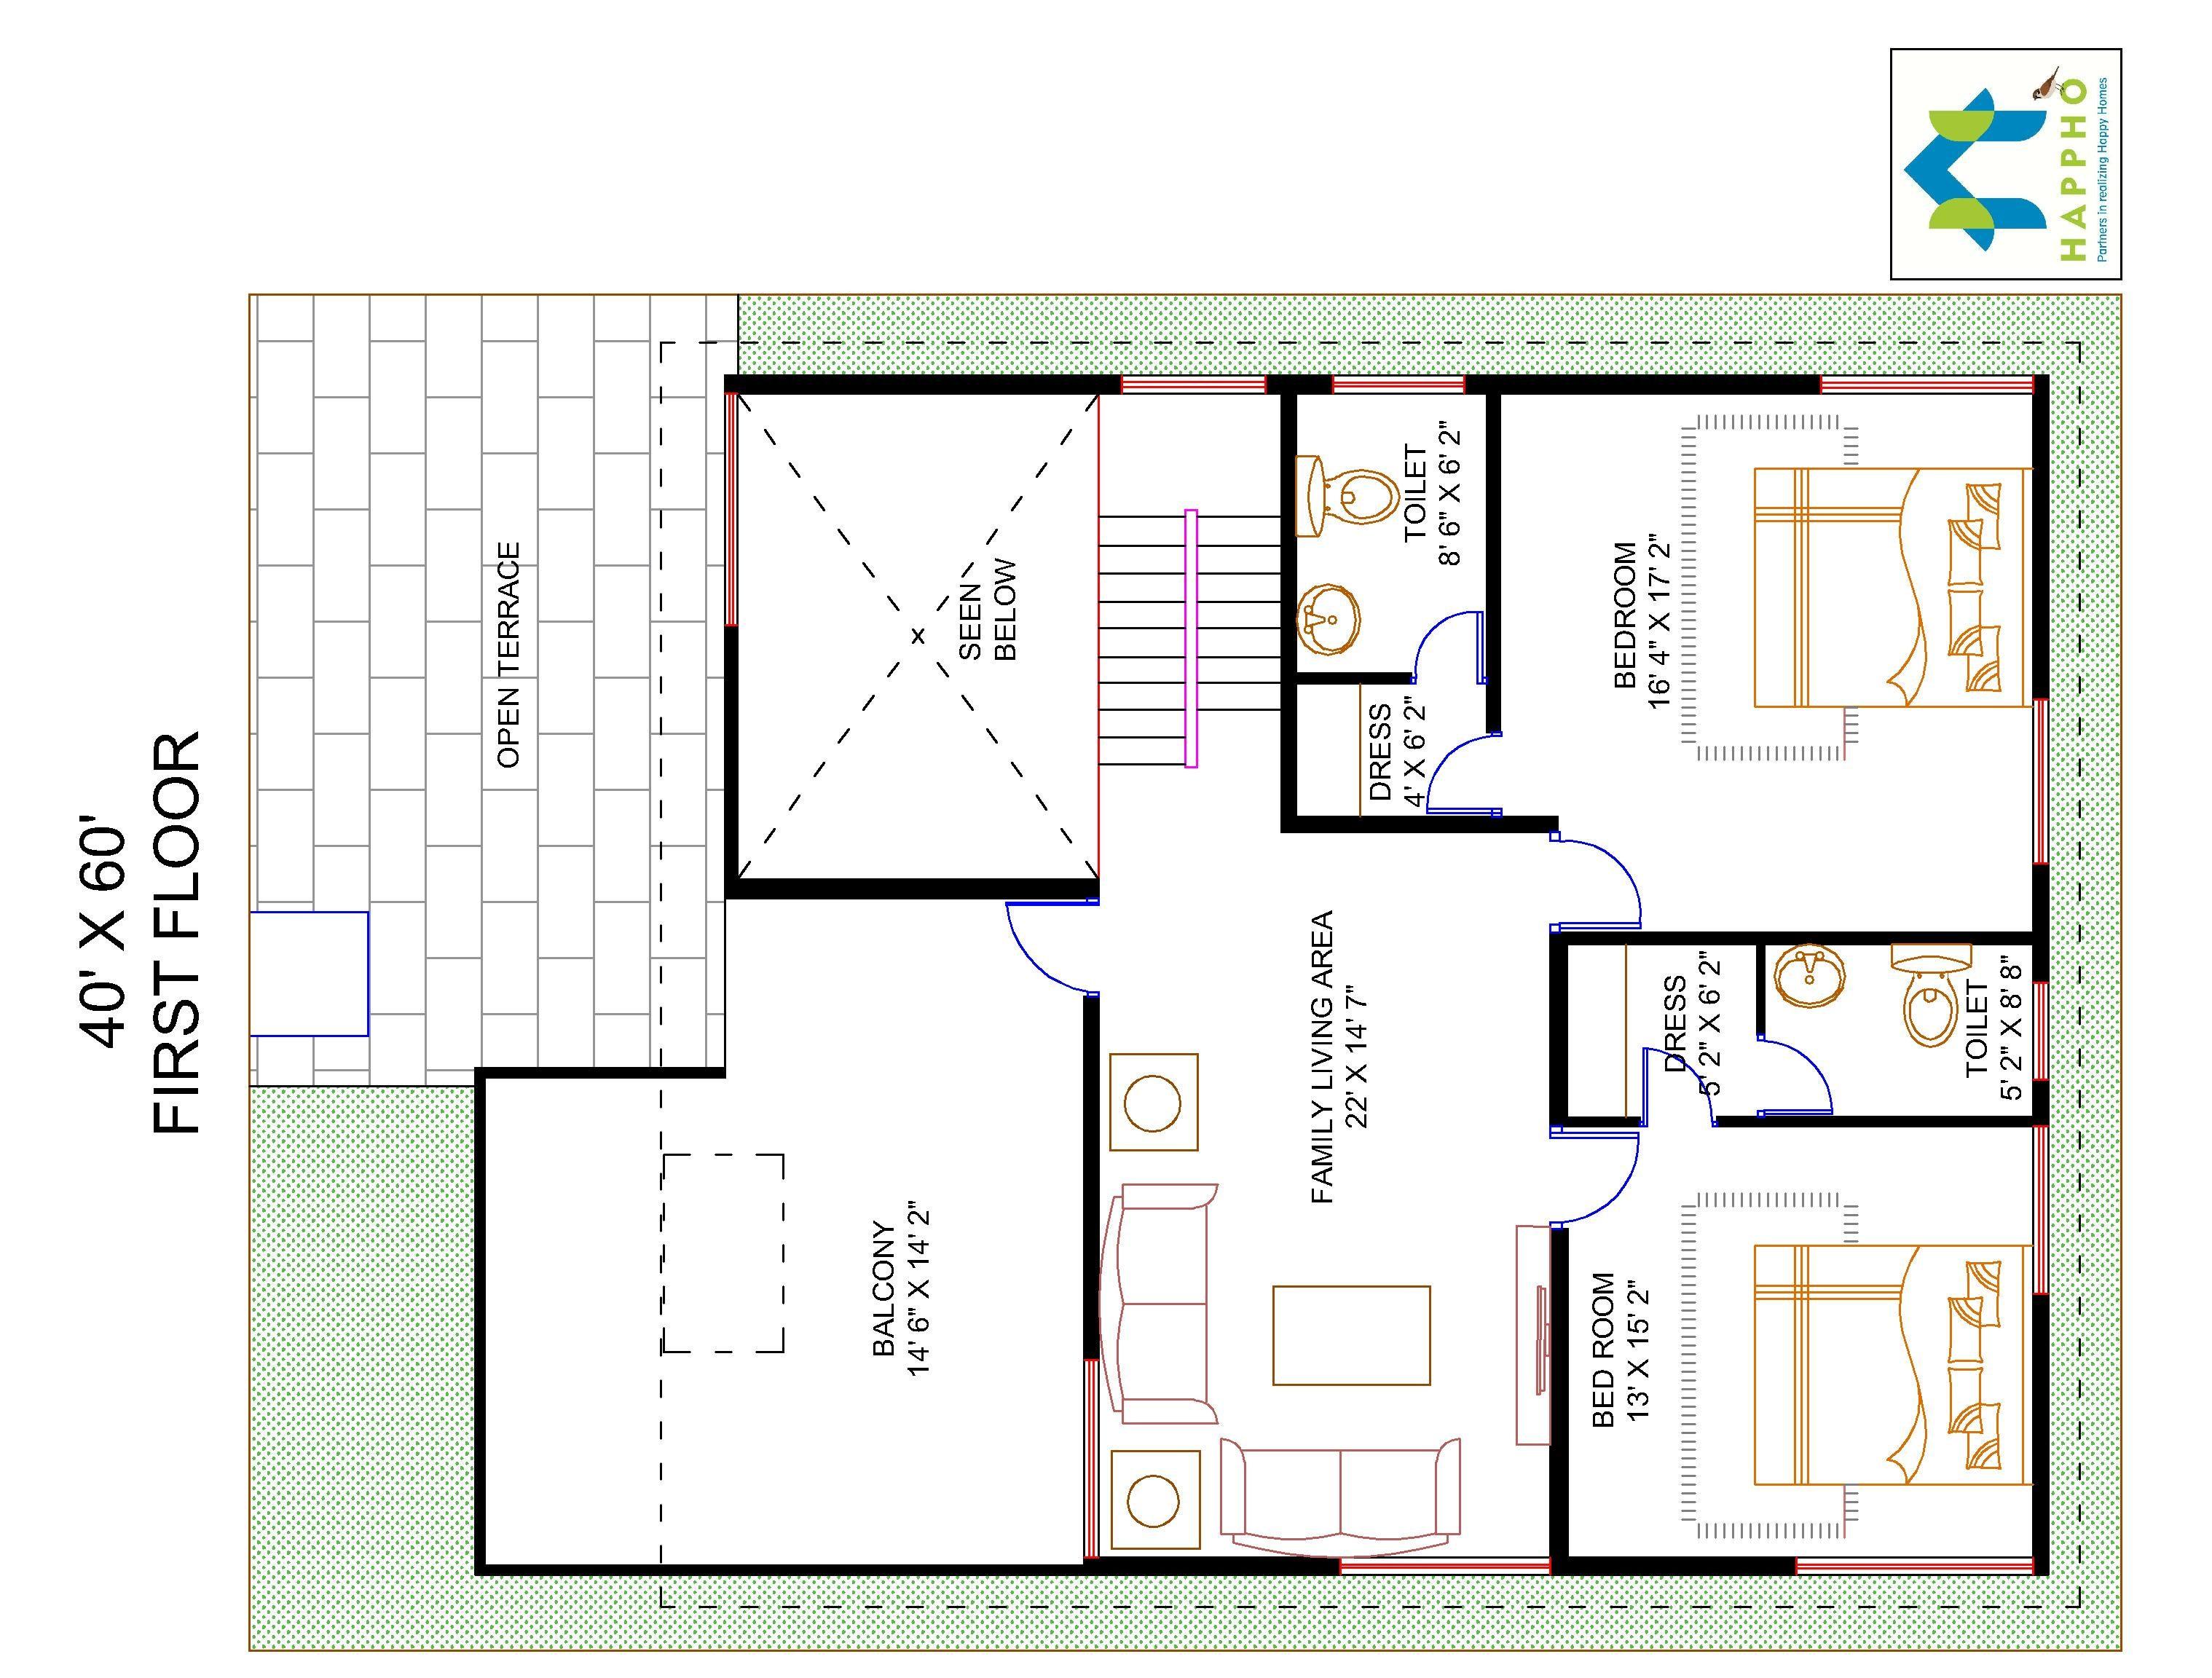 4-BHK Floor Plan For 40 X 60 Plot (2400 Square Feet/267